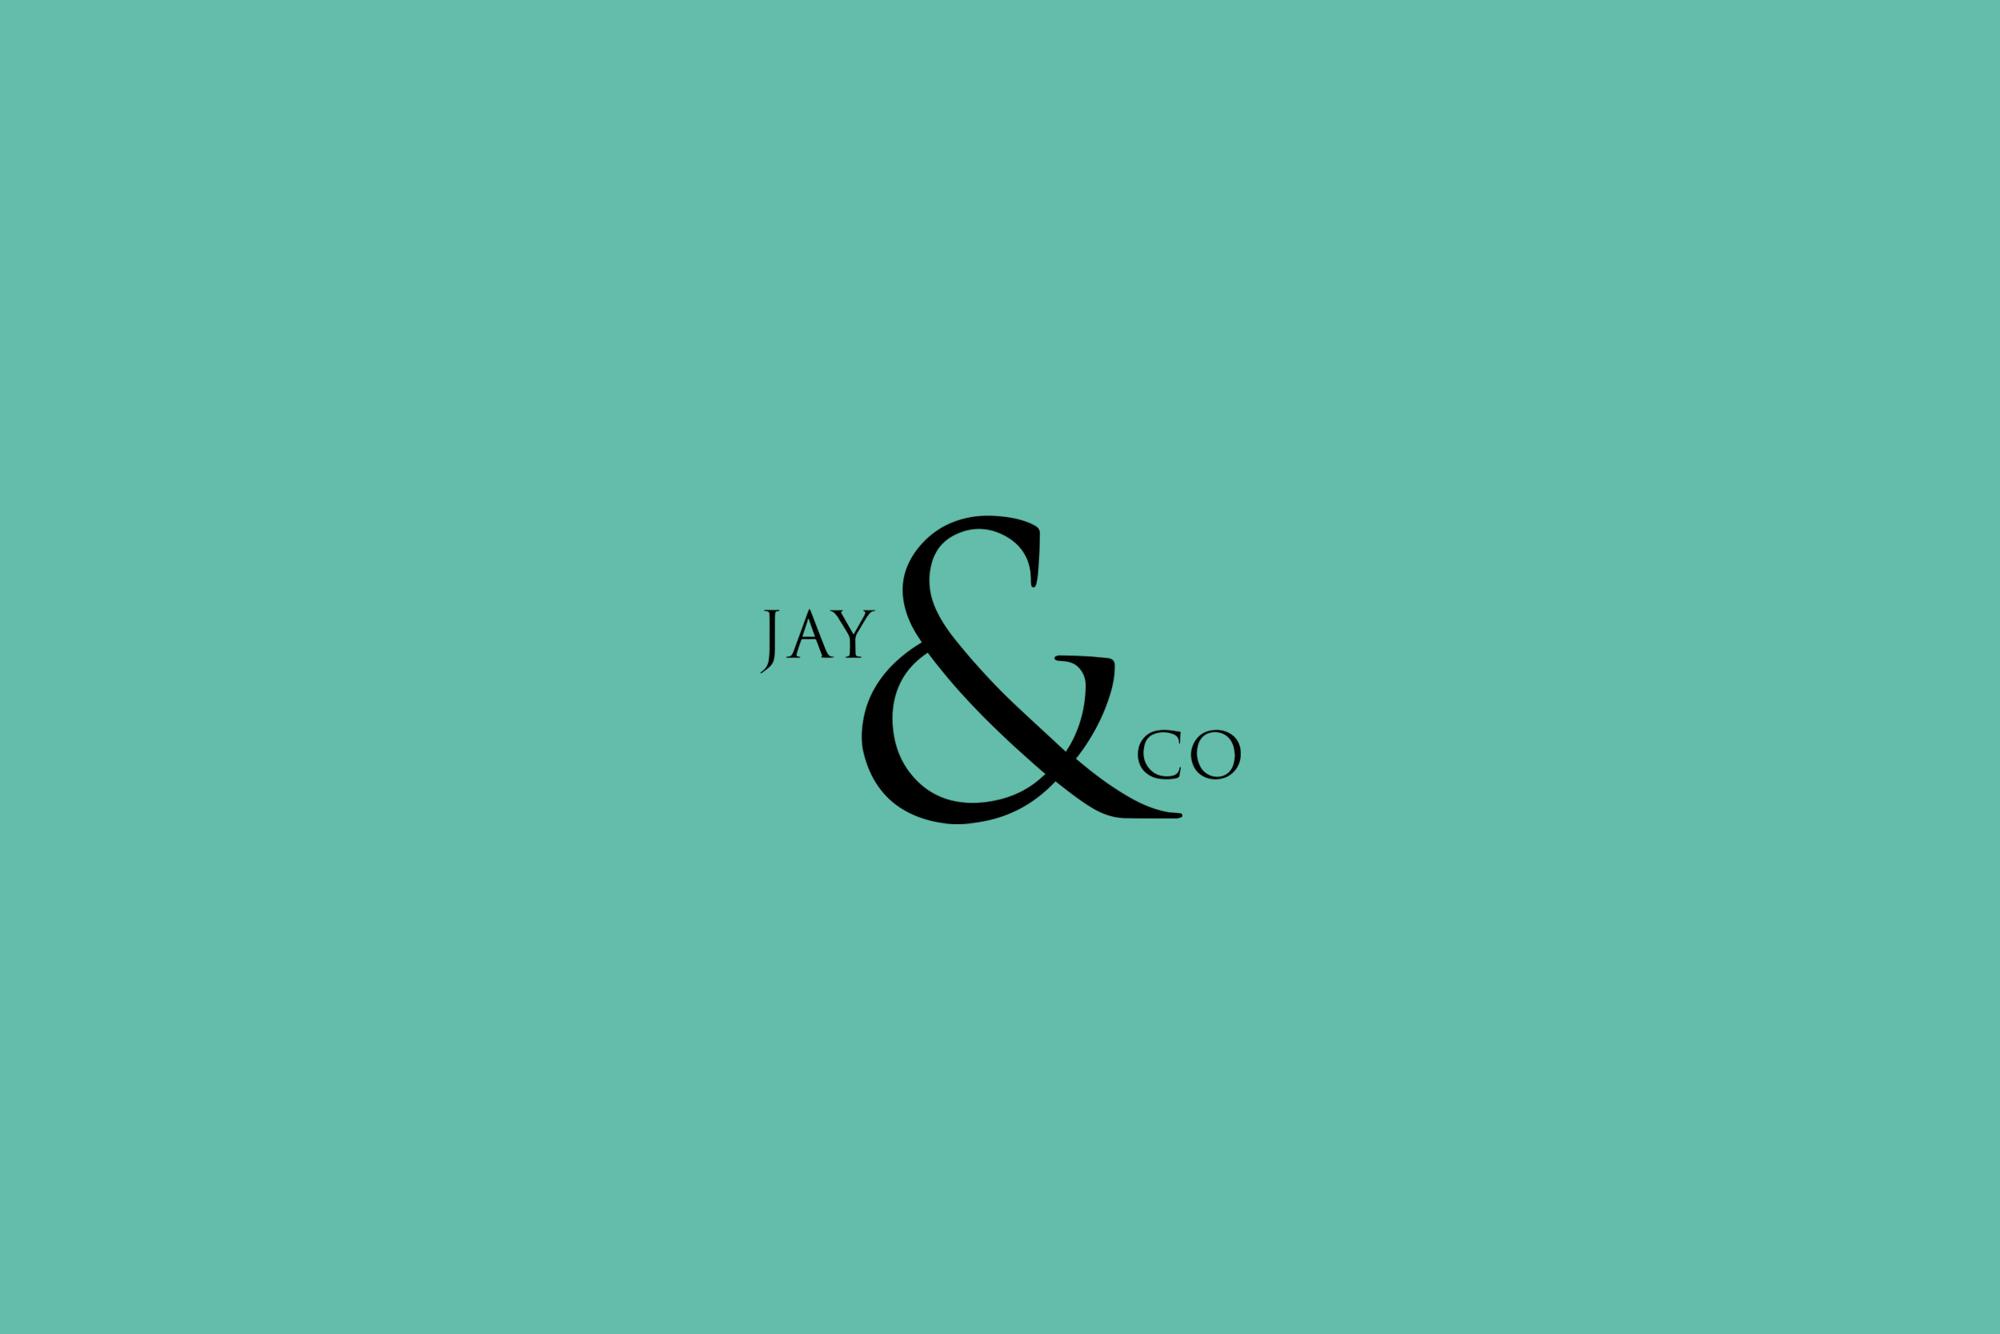 Jay & Co by Wah Wah Lab - Logo Design.jpg